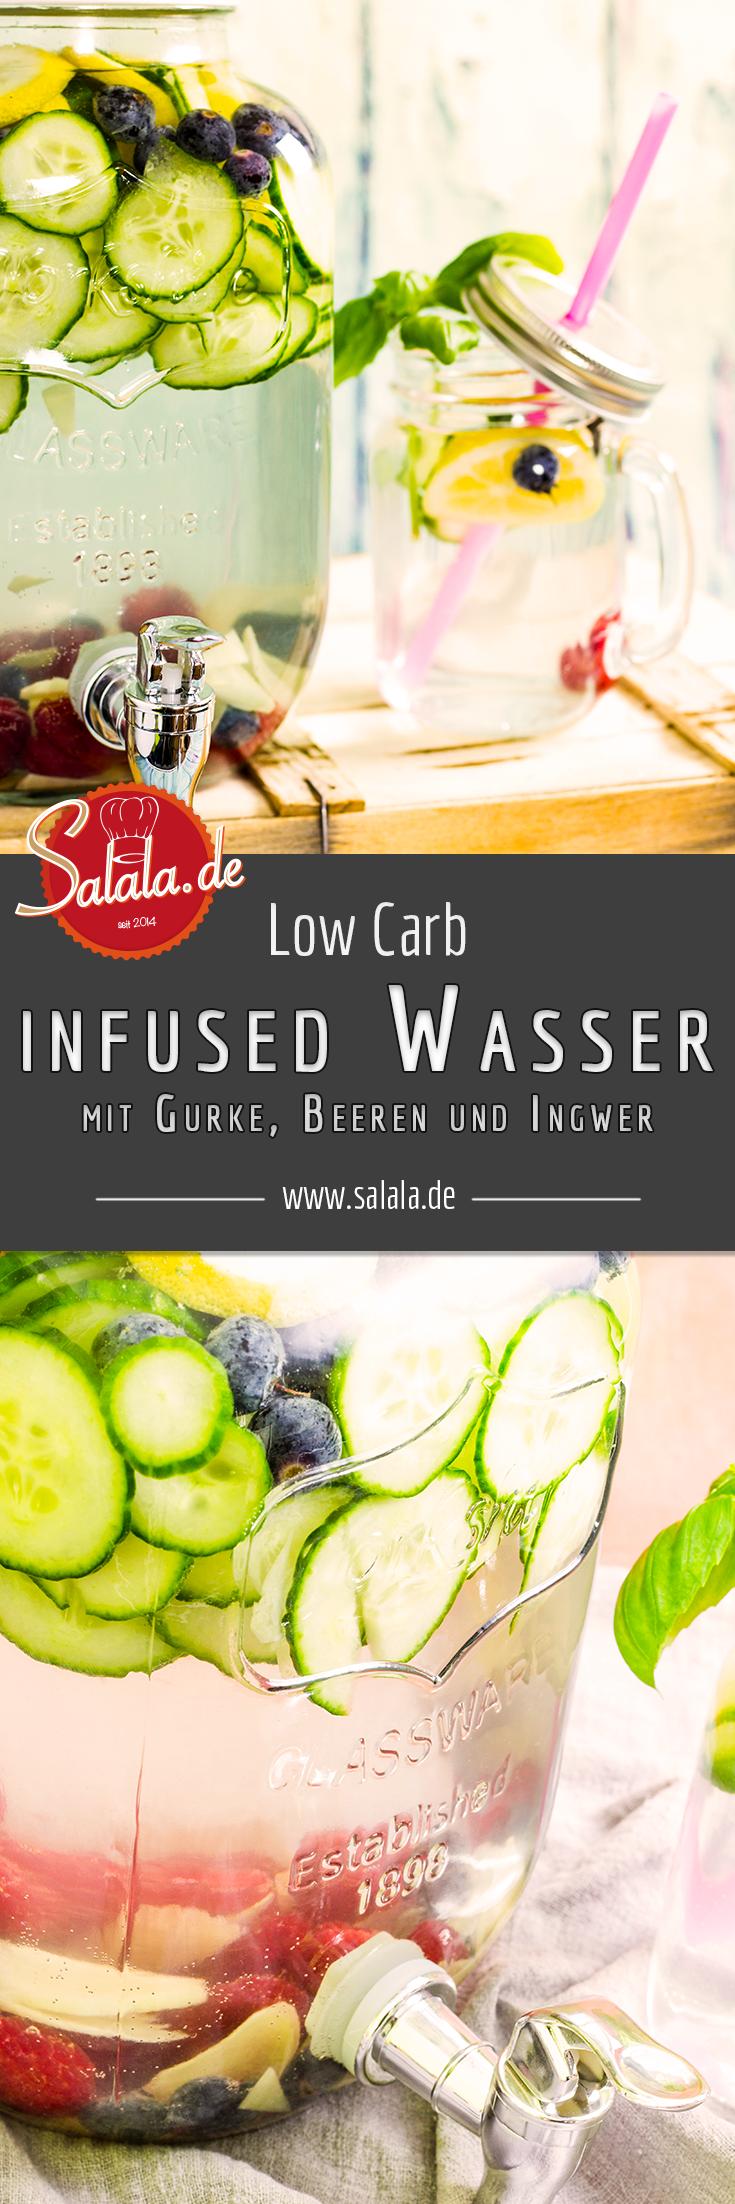 Wasser mit Geschmack – Low Carb | salala.de – Low Carb mit Vroni & Nico